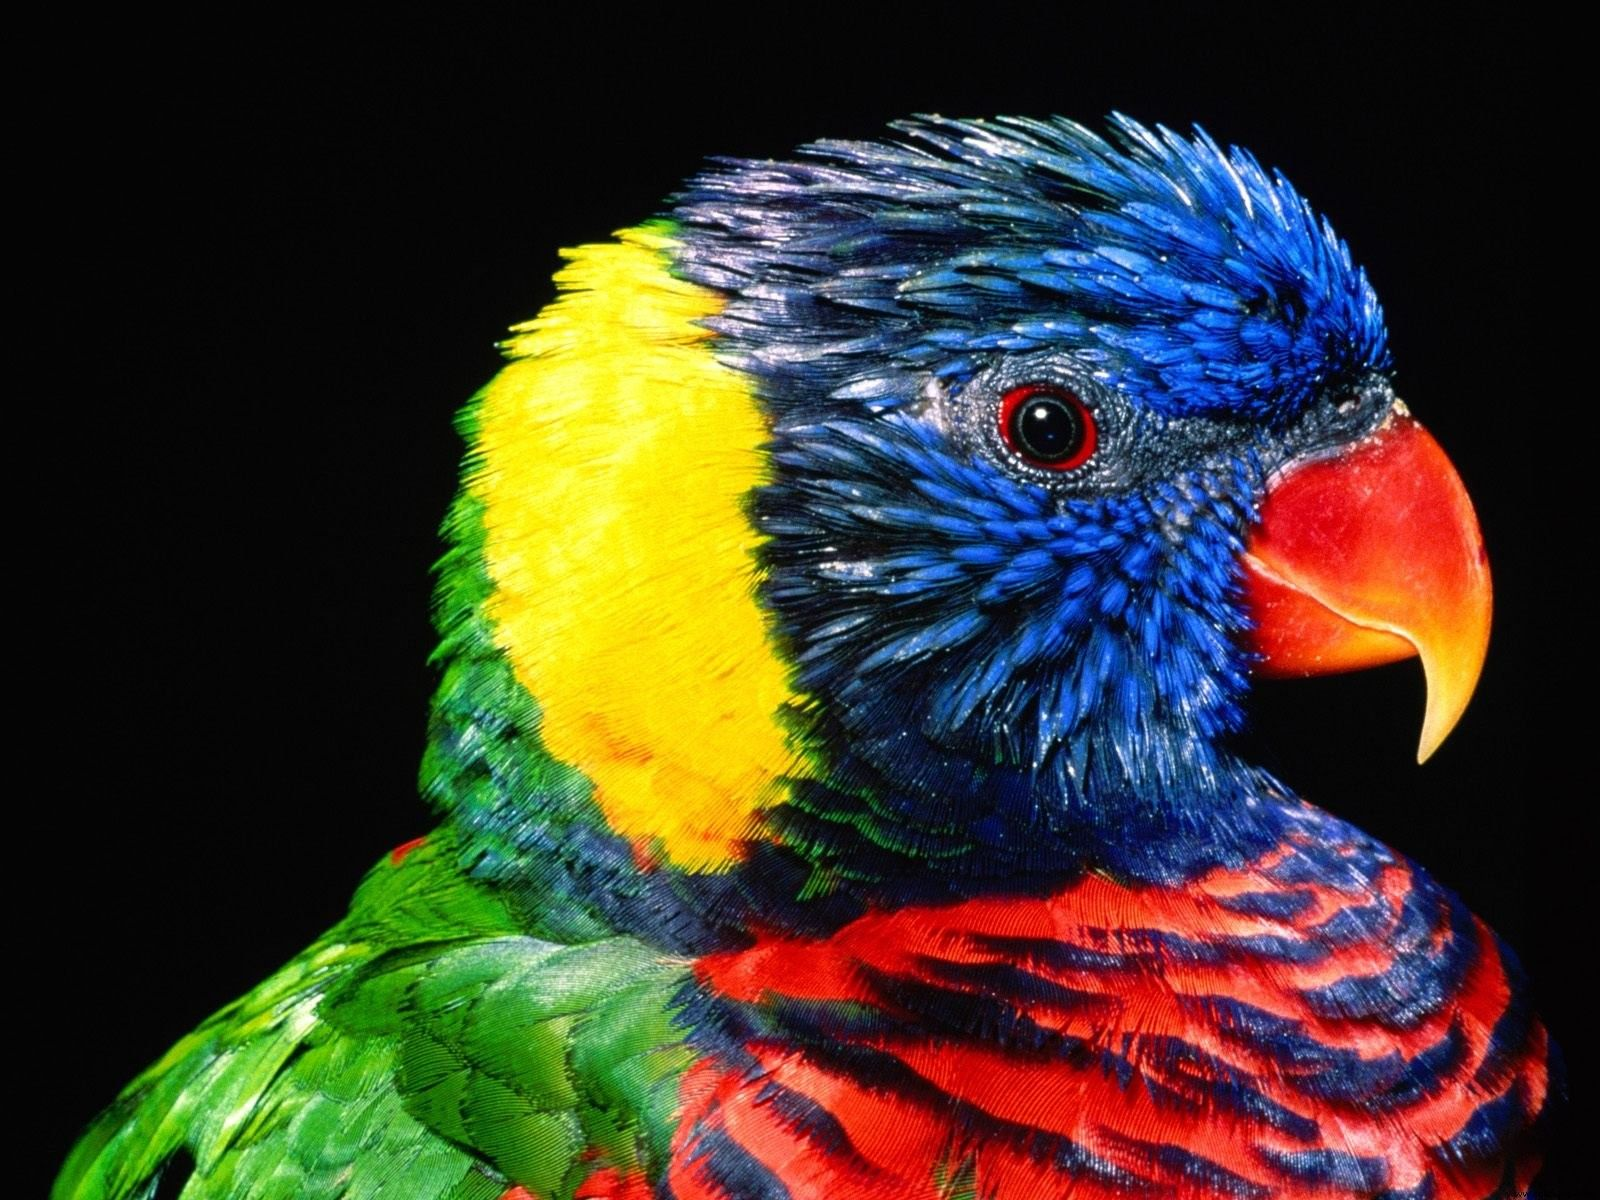 Parrot Wallpapers | Free Download Colorful Birds HD Desktop Images